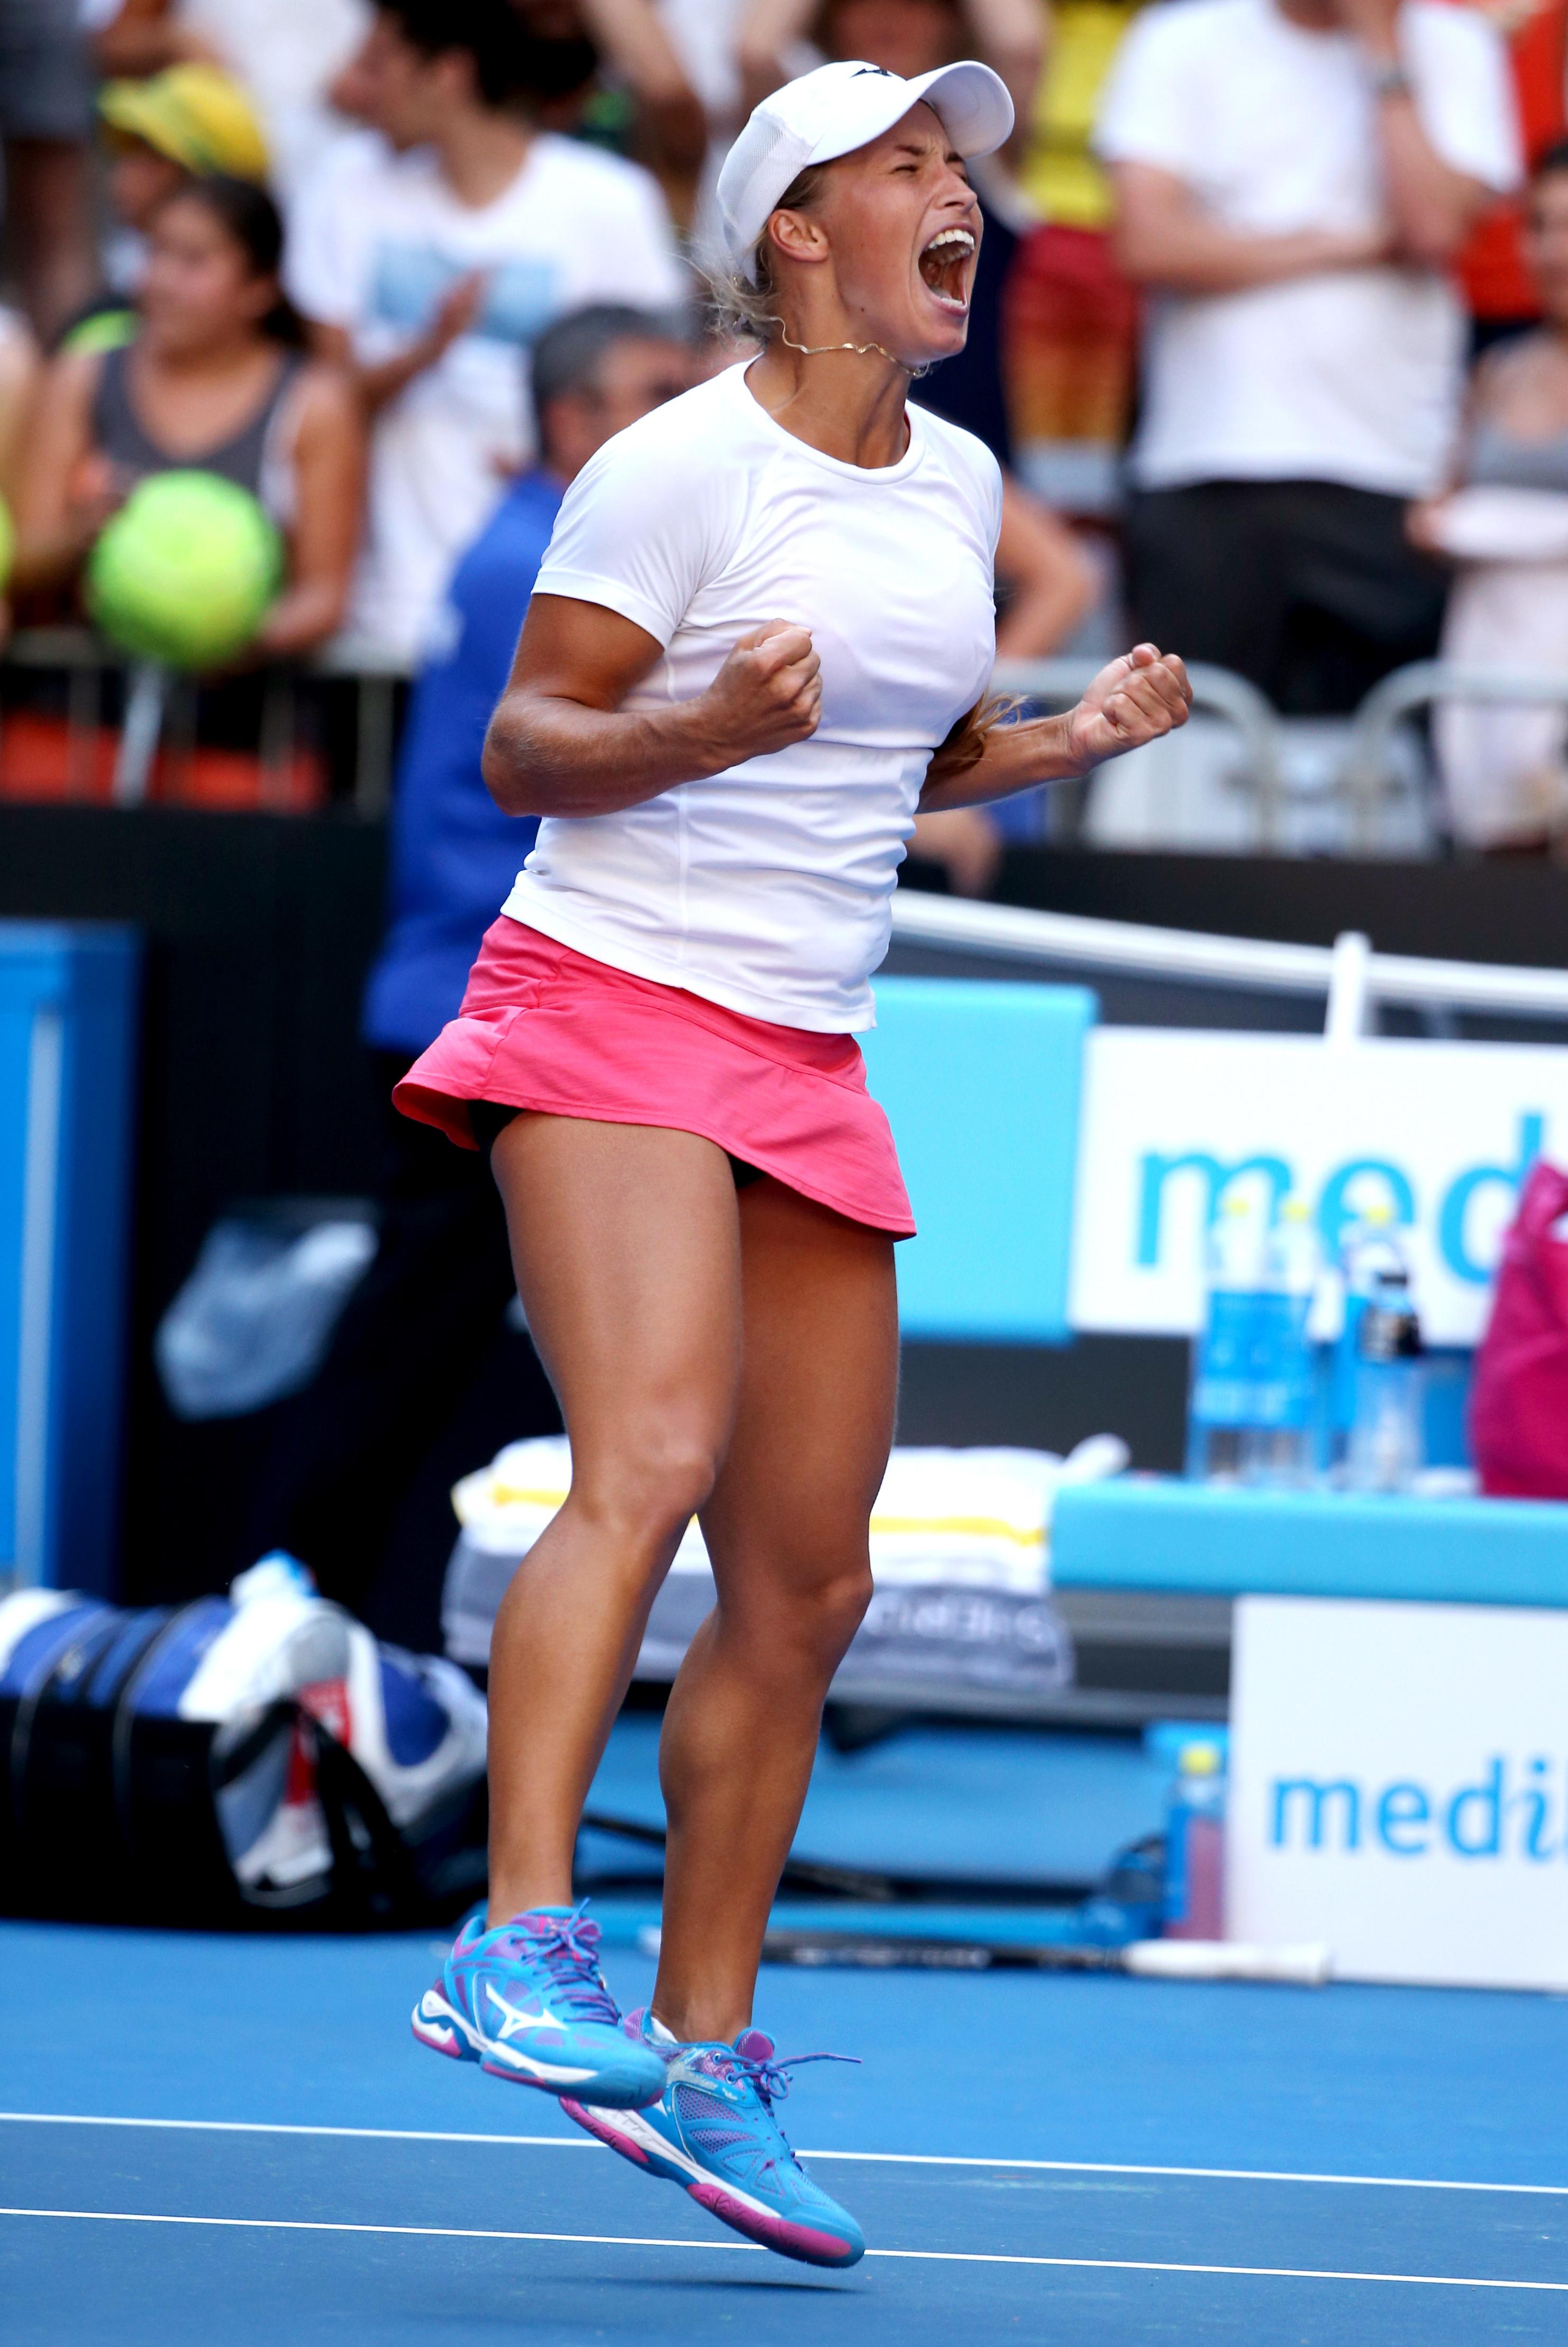 australian_open_tennis-eb90c258d4b848479_r364.jpeg